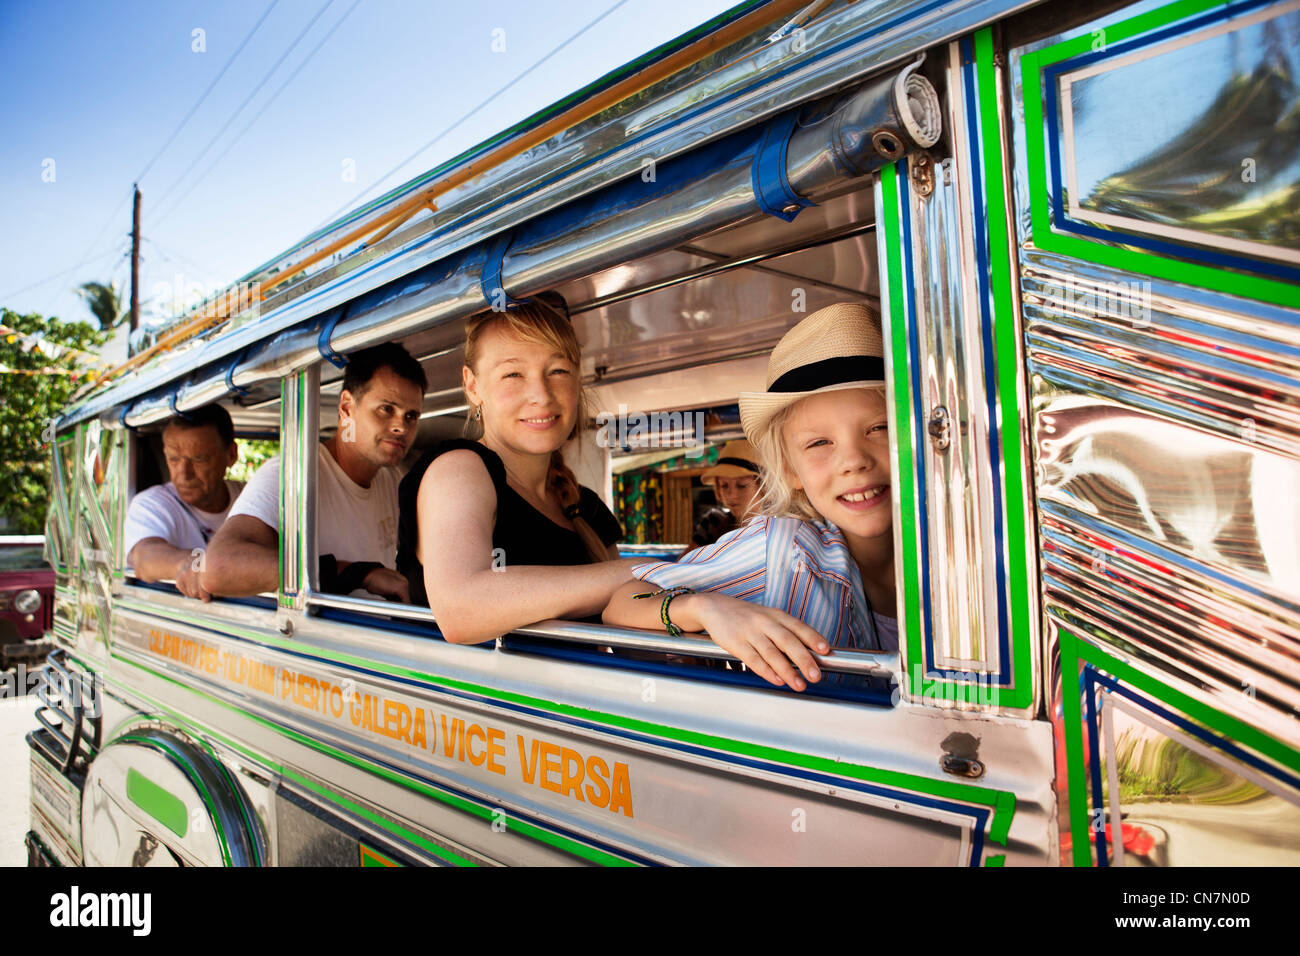 Passengers sitting by bus window - Stock Image